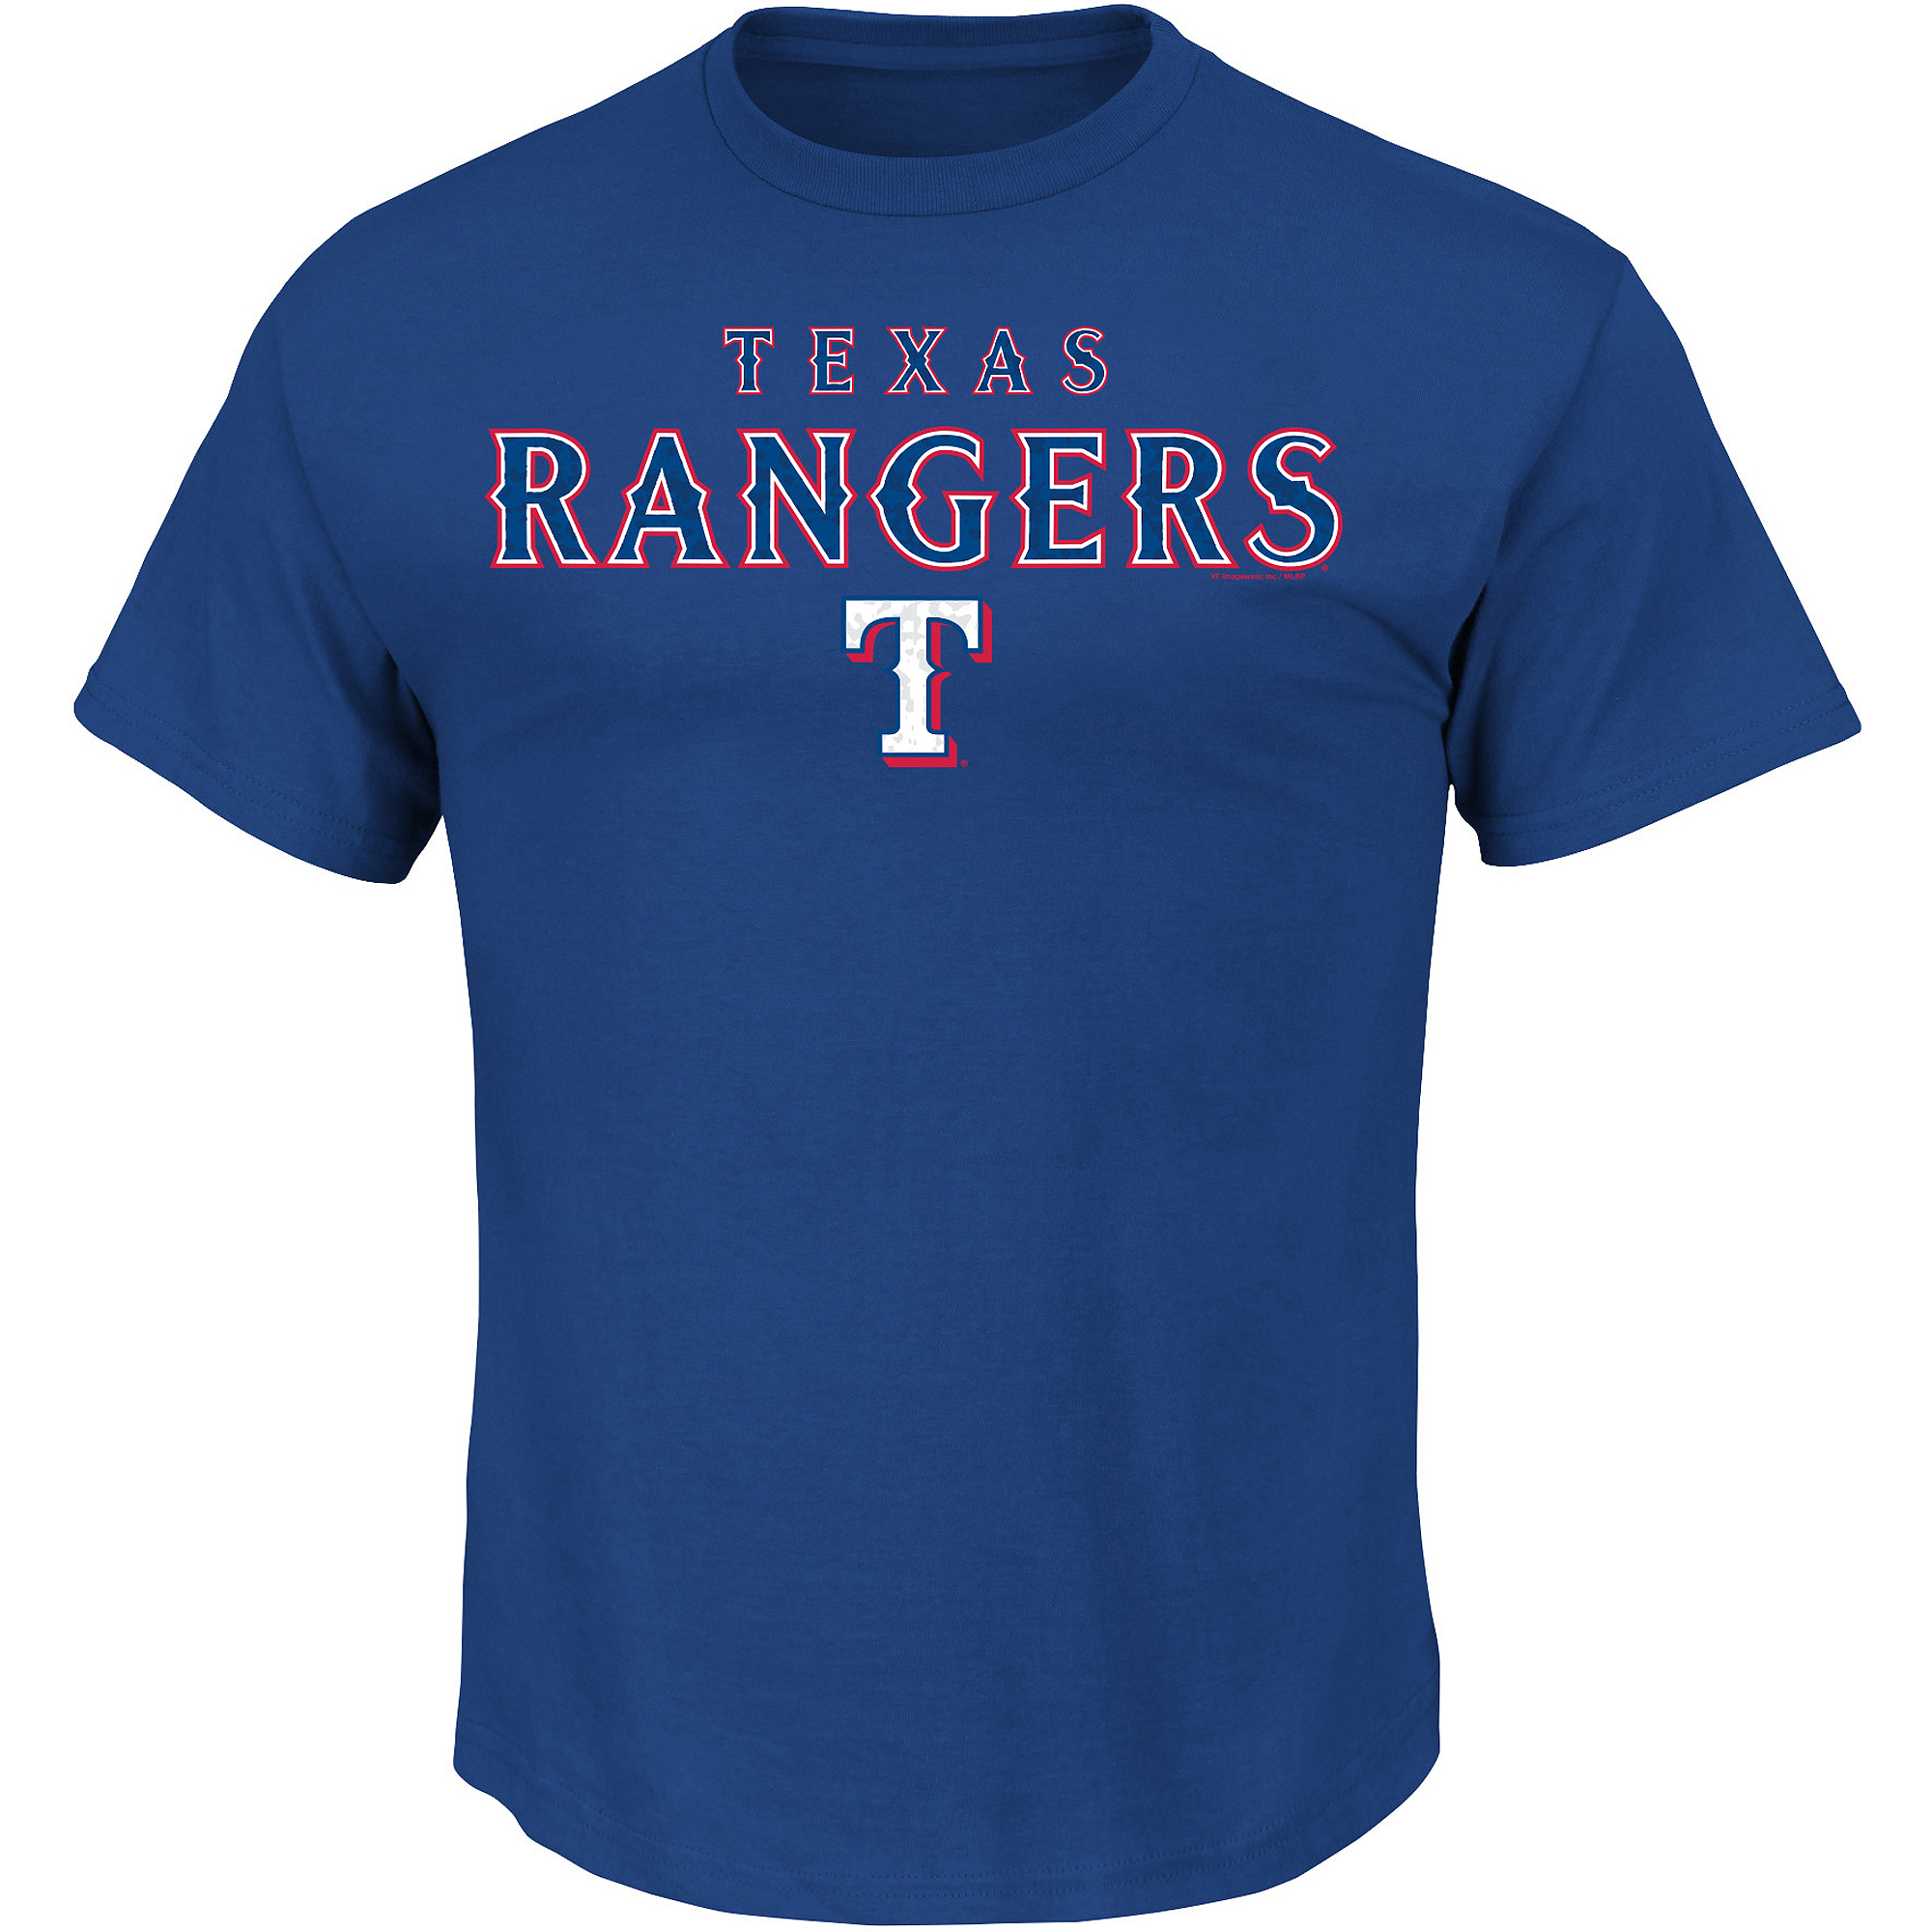 MLB Men's Texas Rangers Team Tee